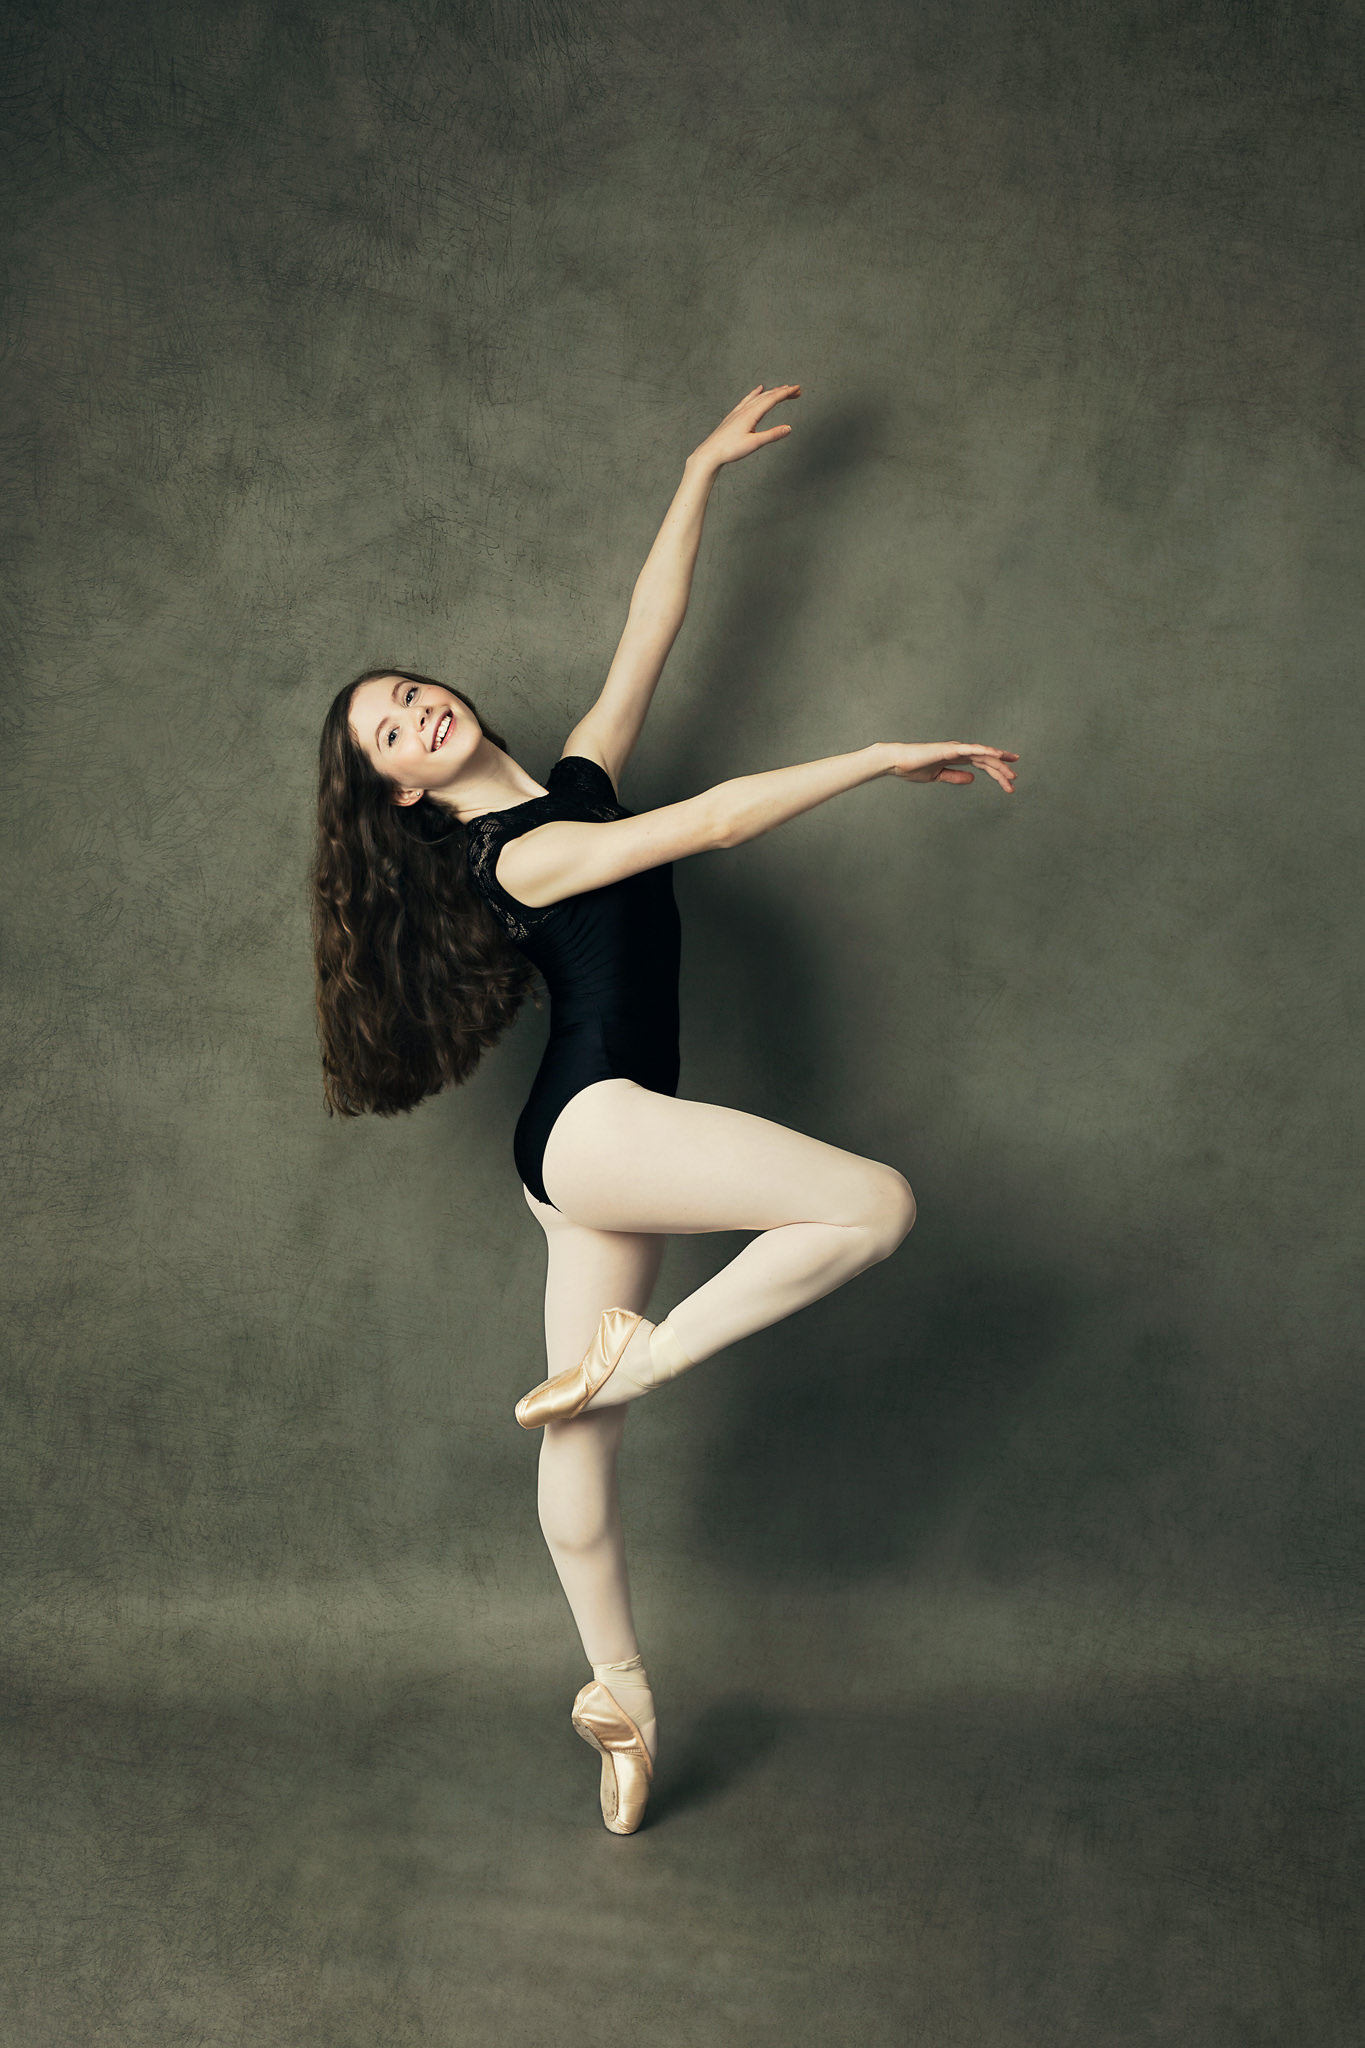 tara_morris_ballet_photography_uk_london_bath09-2.jpg